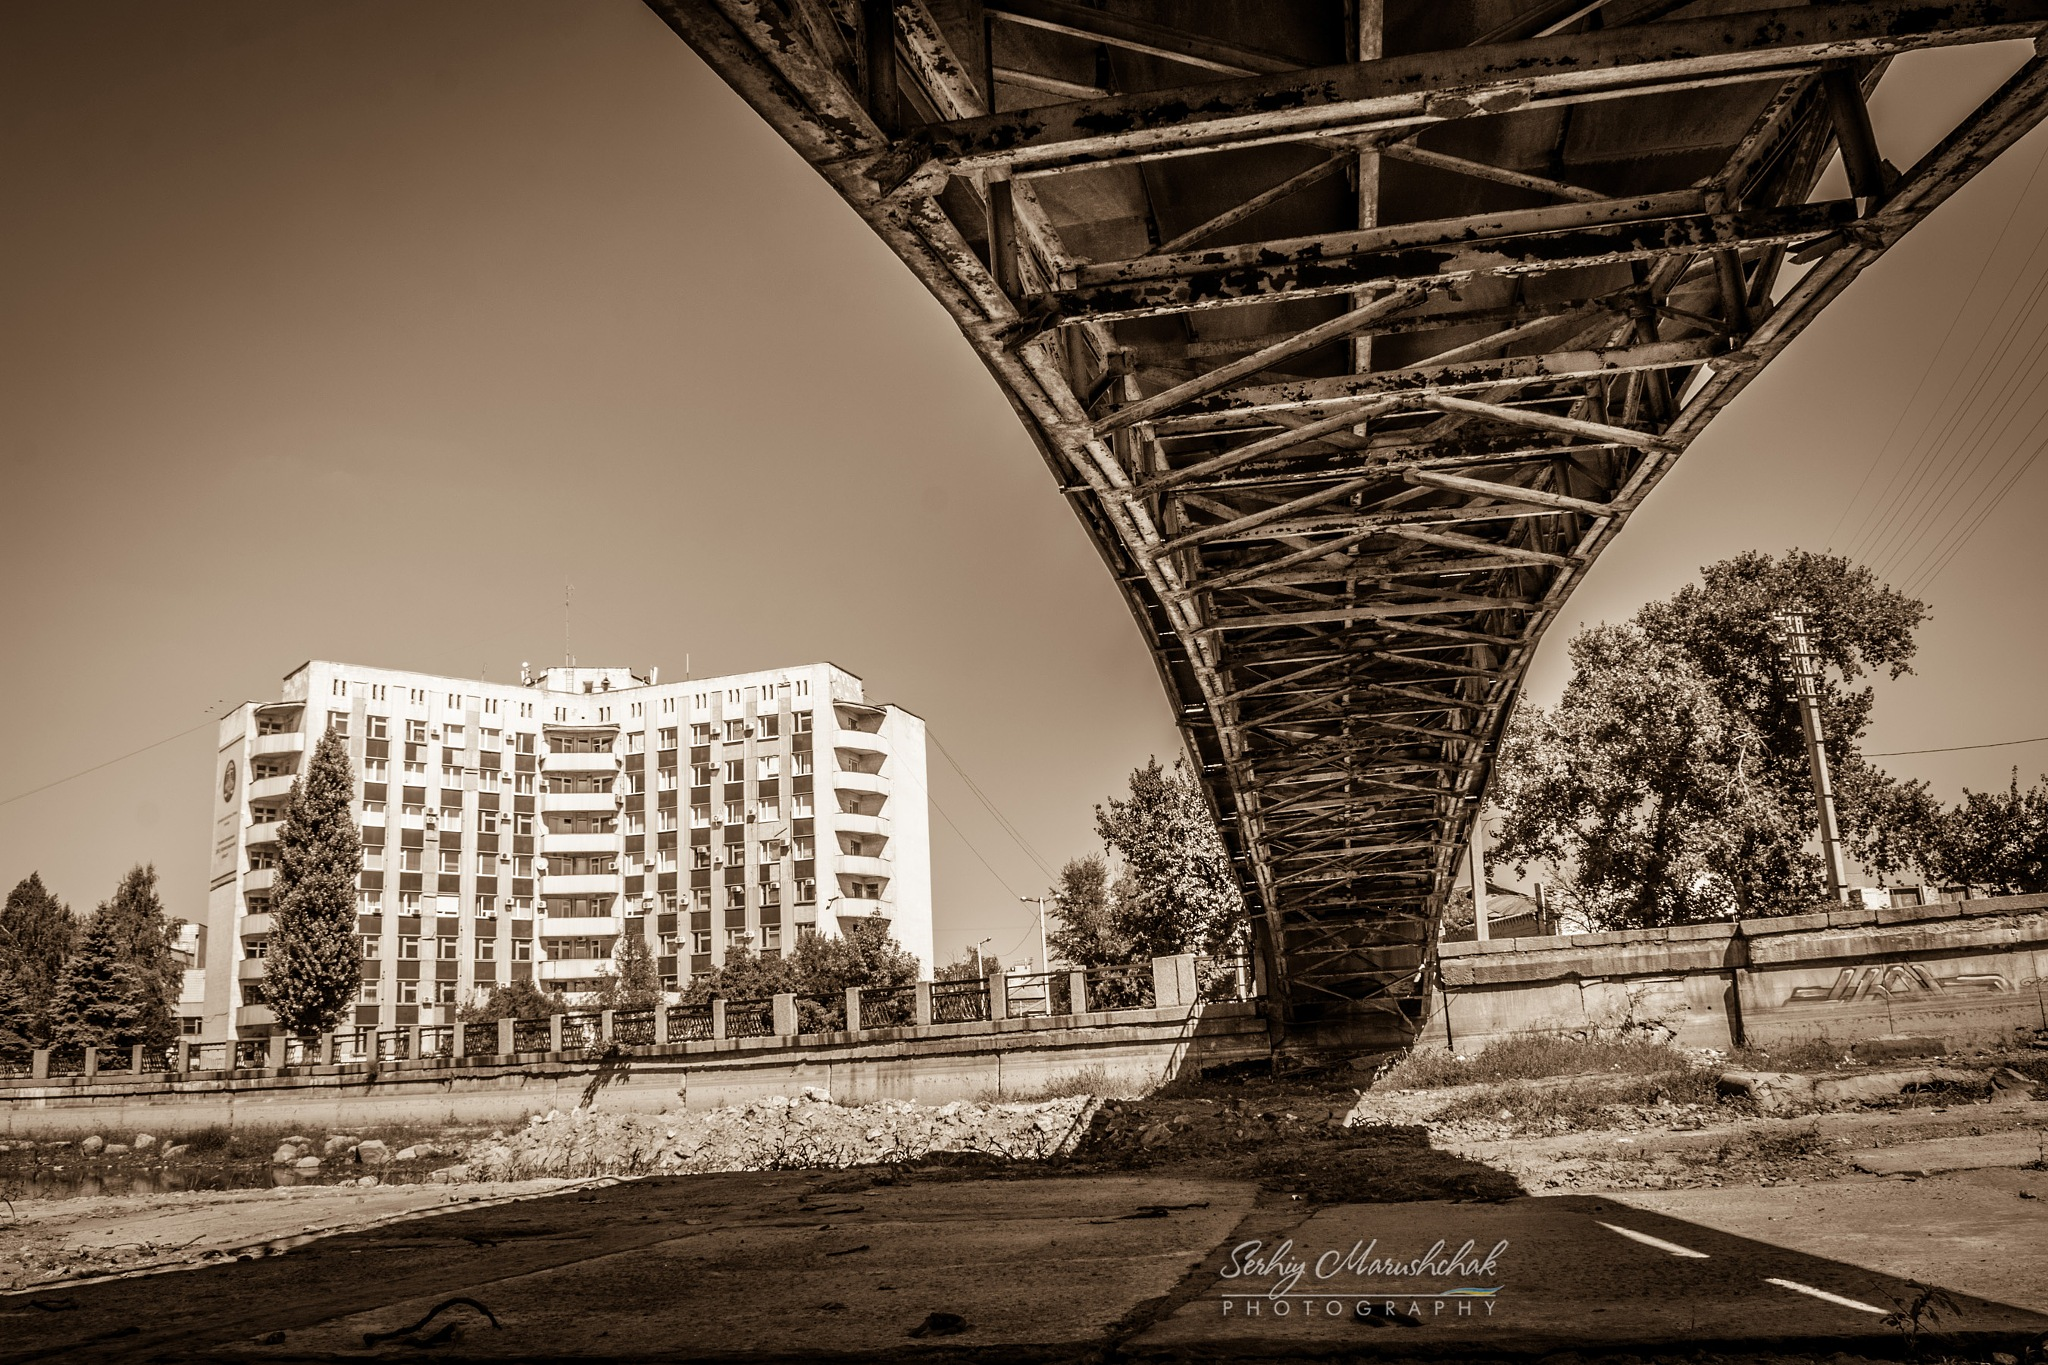 Міст з такого ракурсу... / The bridge from this aspect... by artmars07